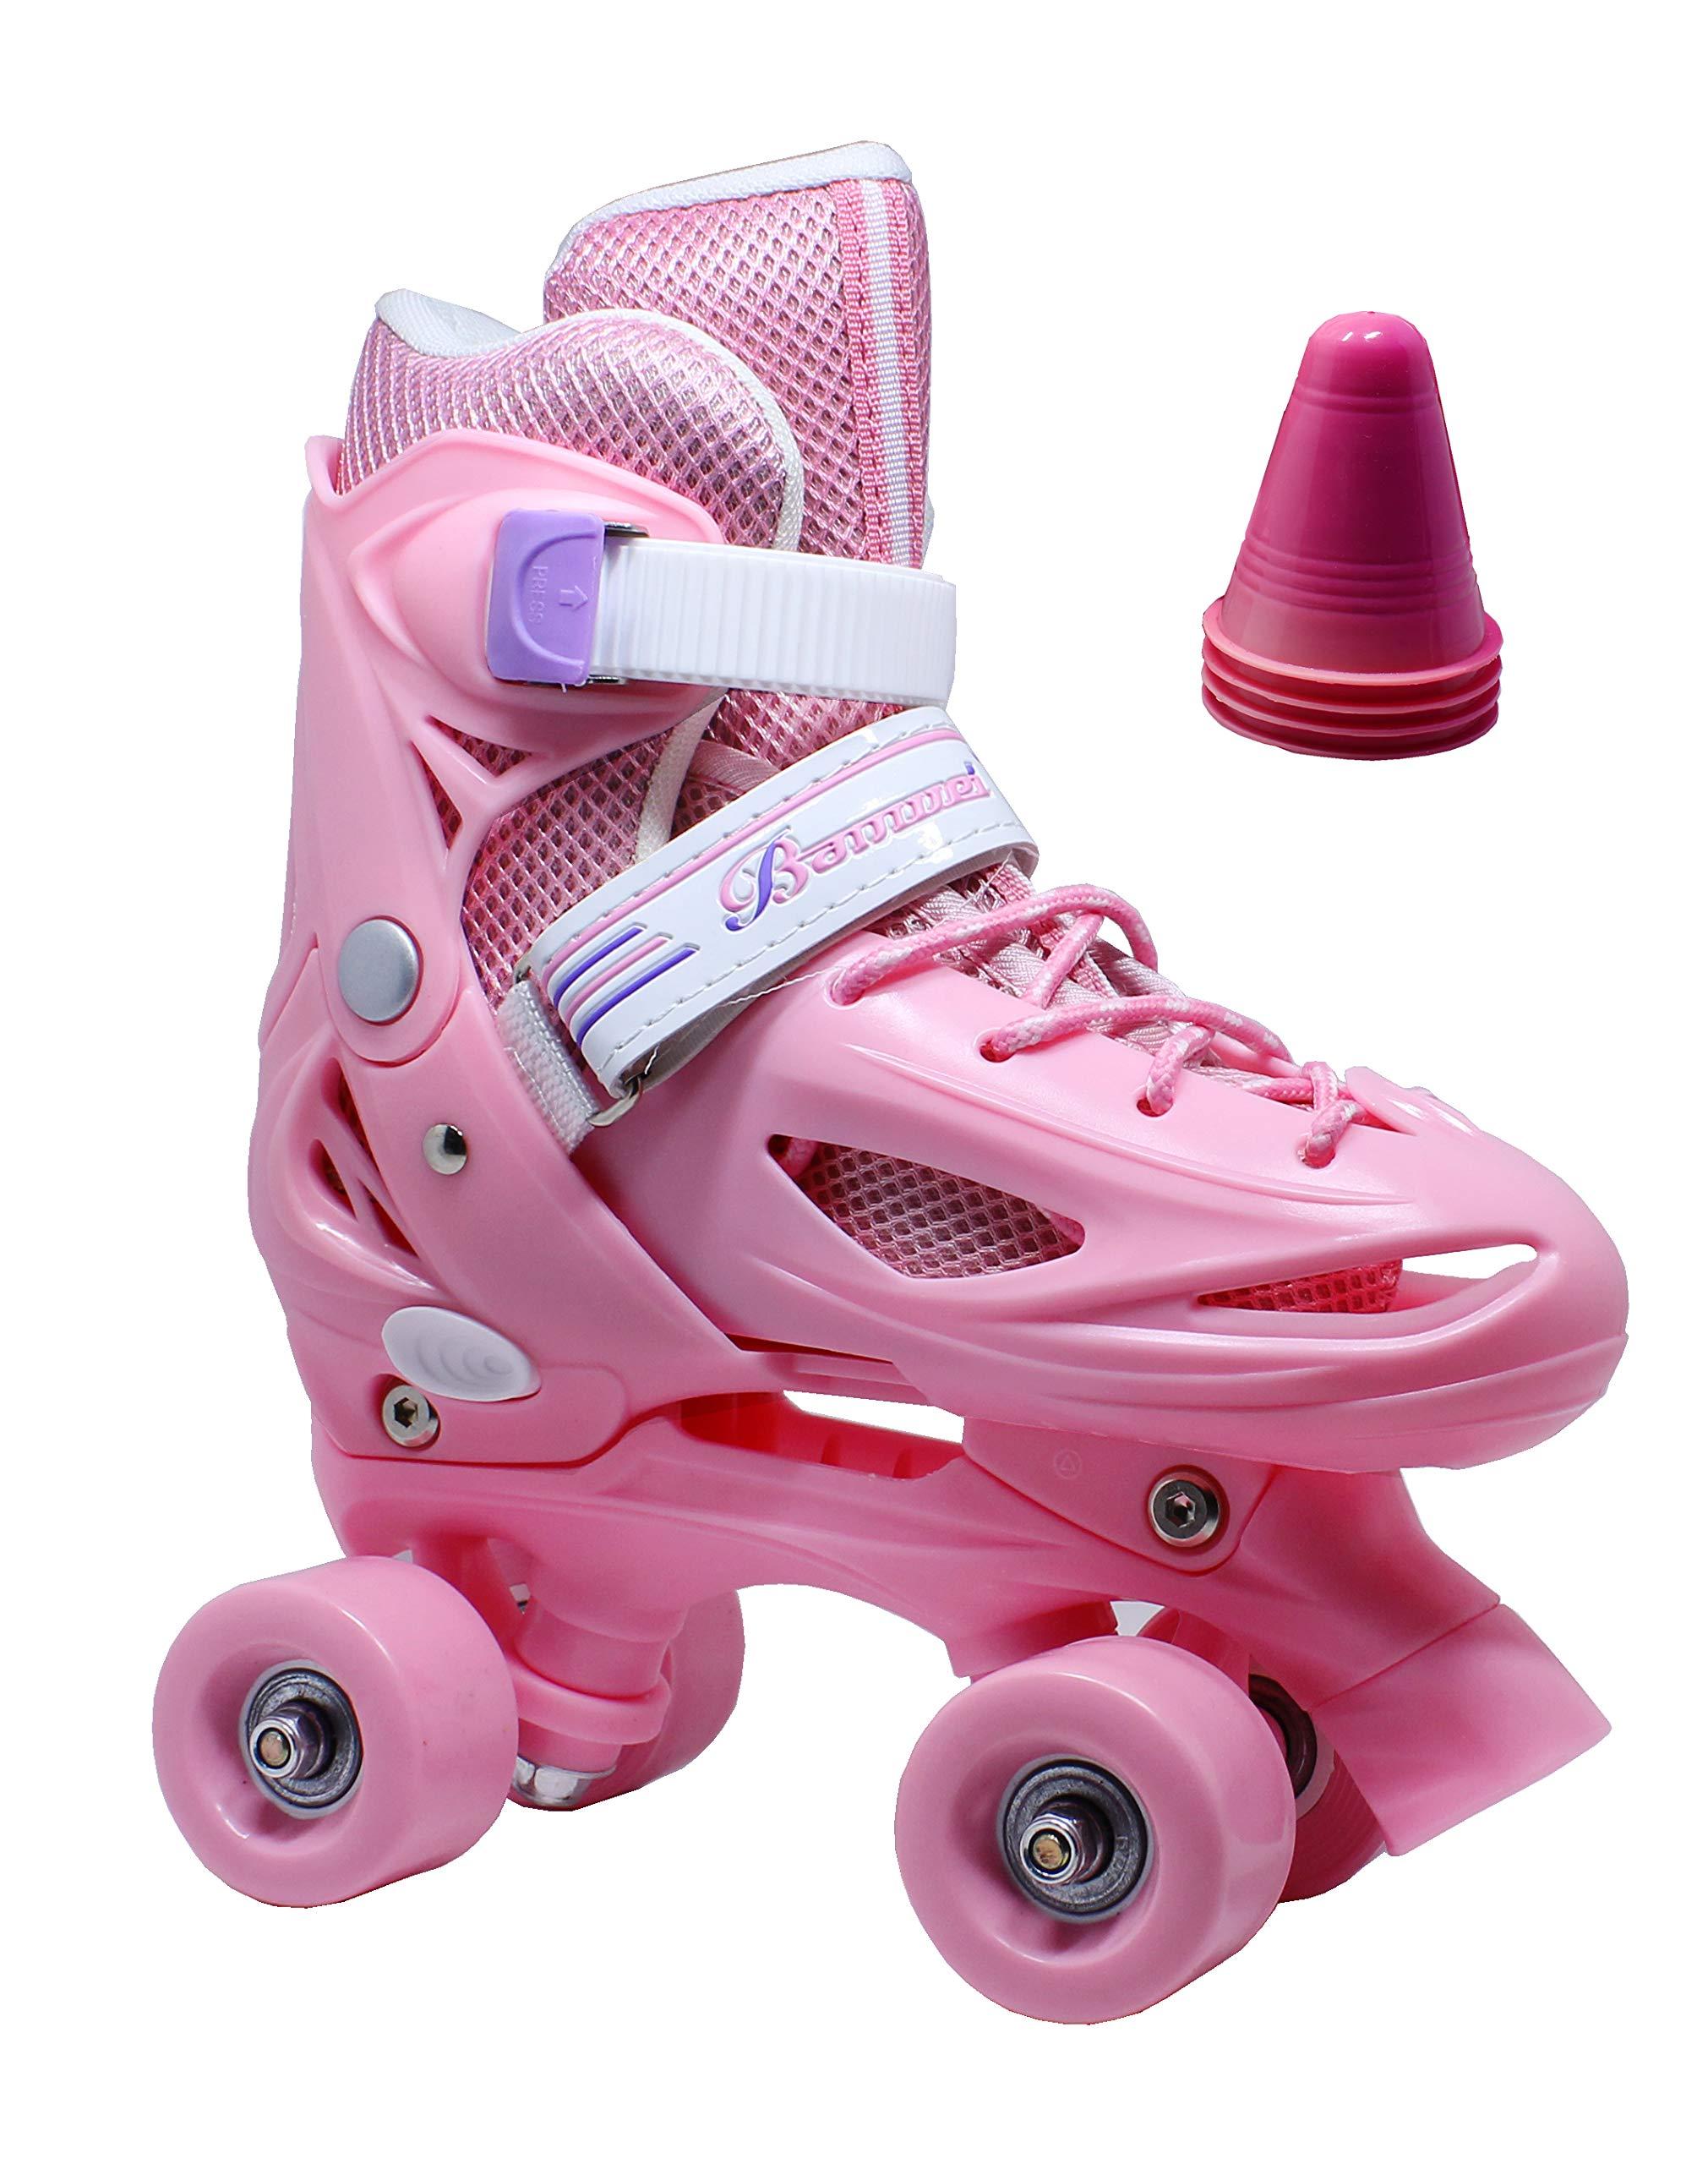 WiiSHAM Fun Roll Adjustable Roller Skates with Four Piles (Flesh Pink, Small) by WiiSHAM